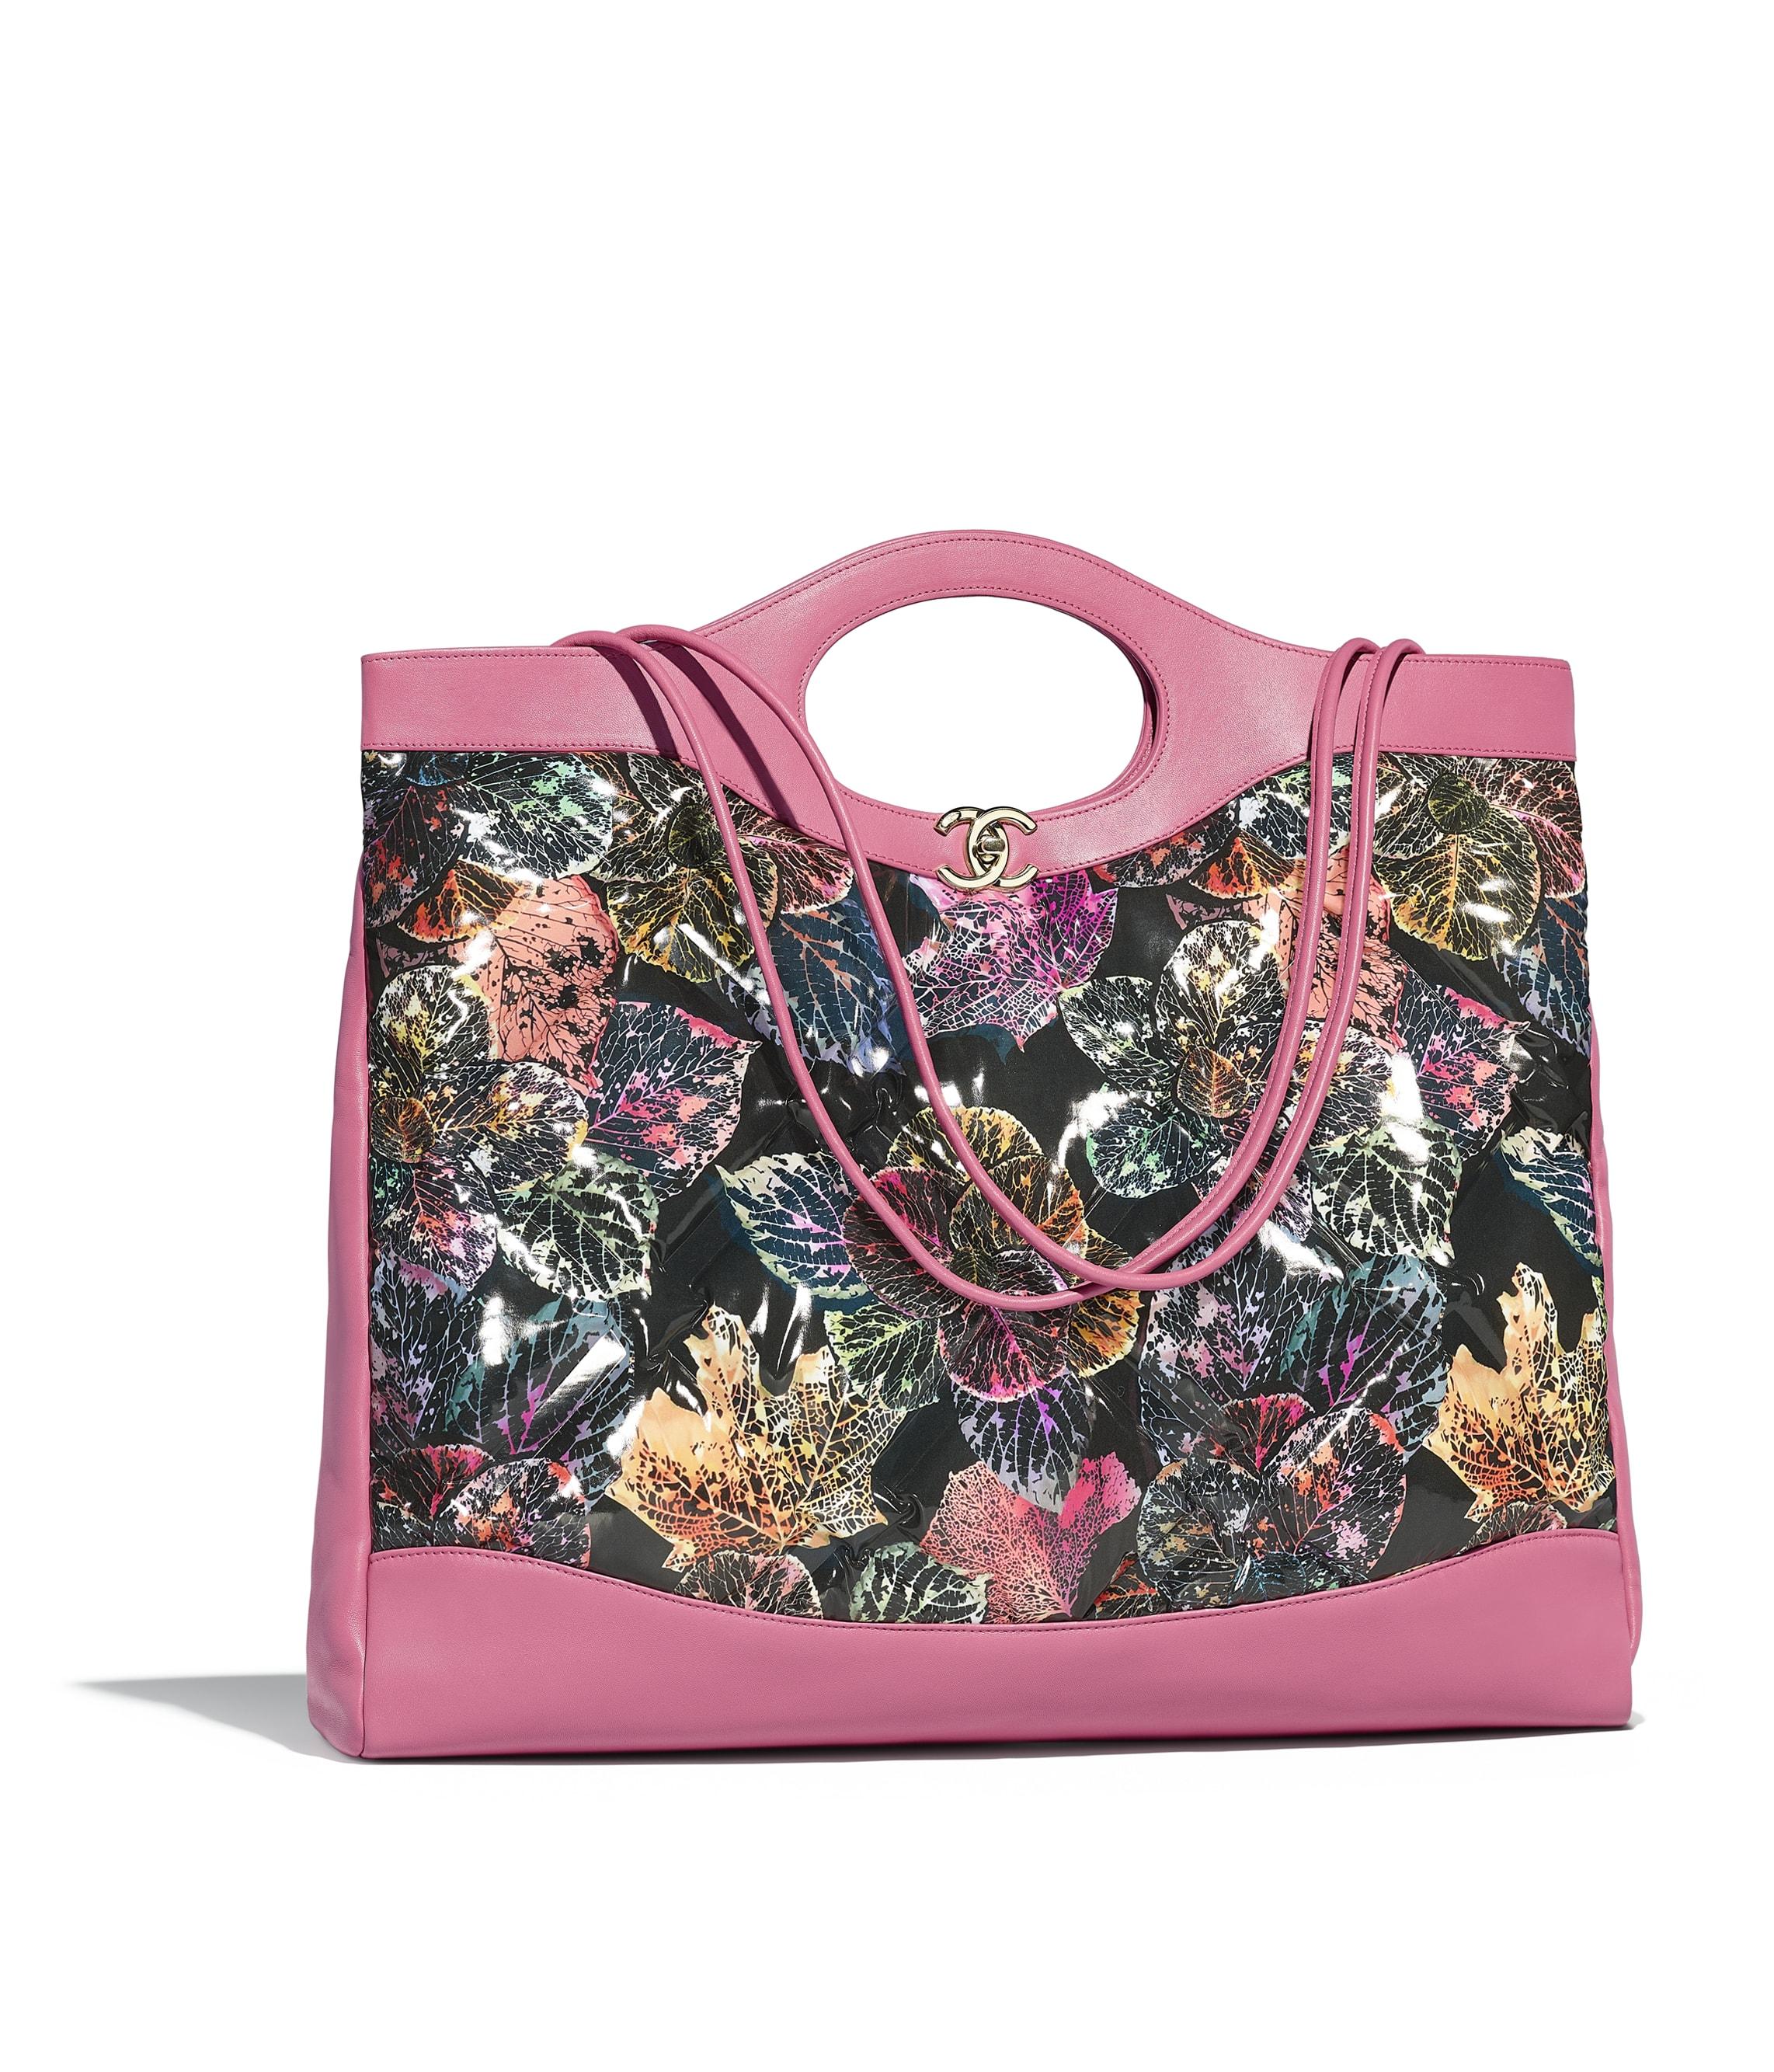 сумка shopping CHANEL 31 большого размера